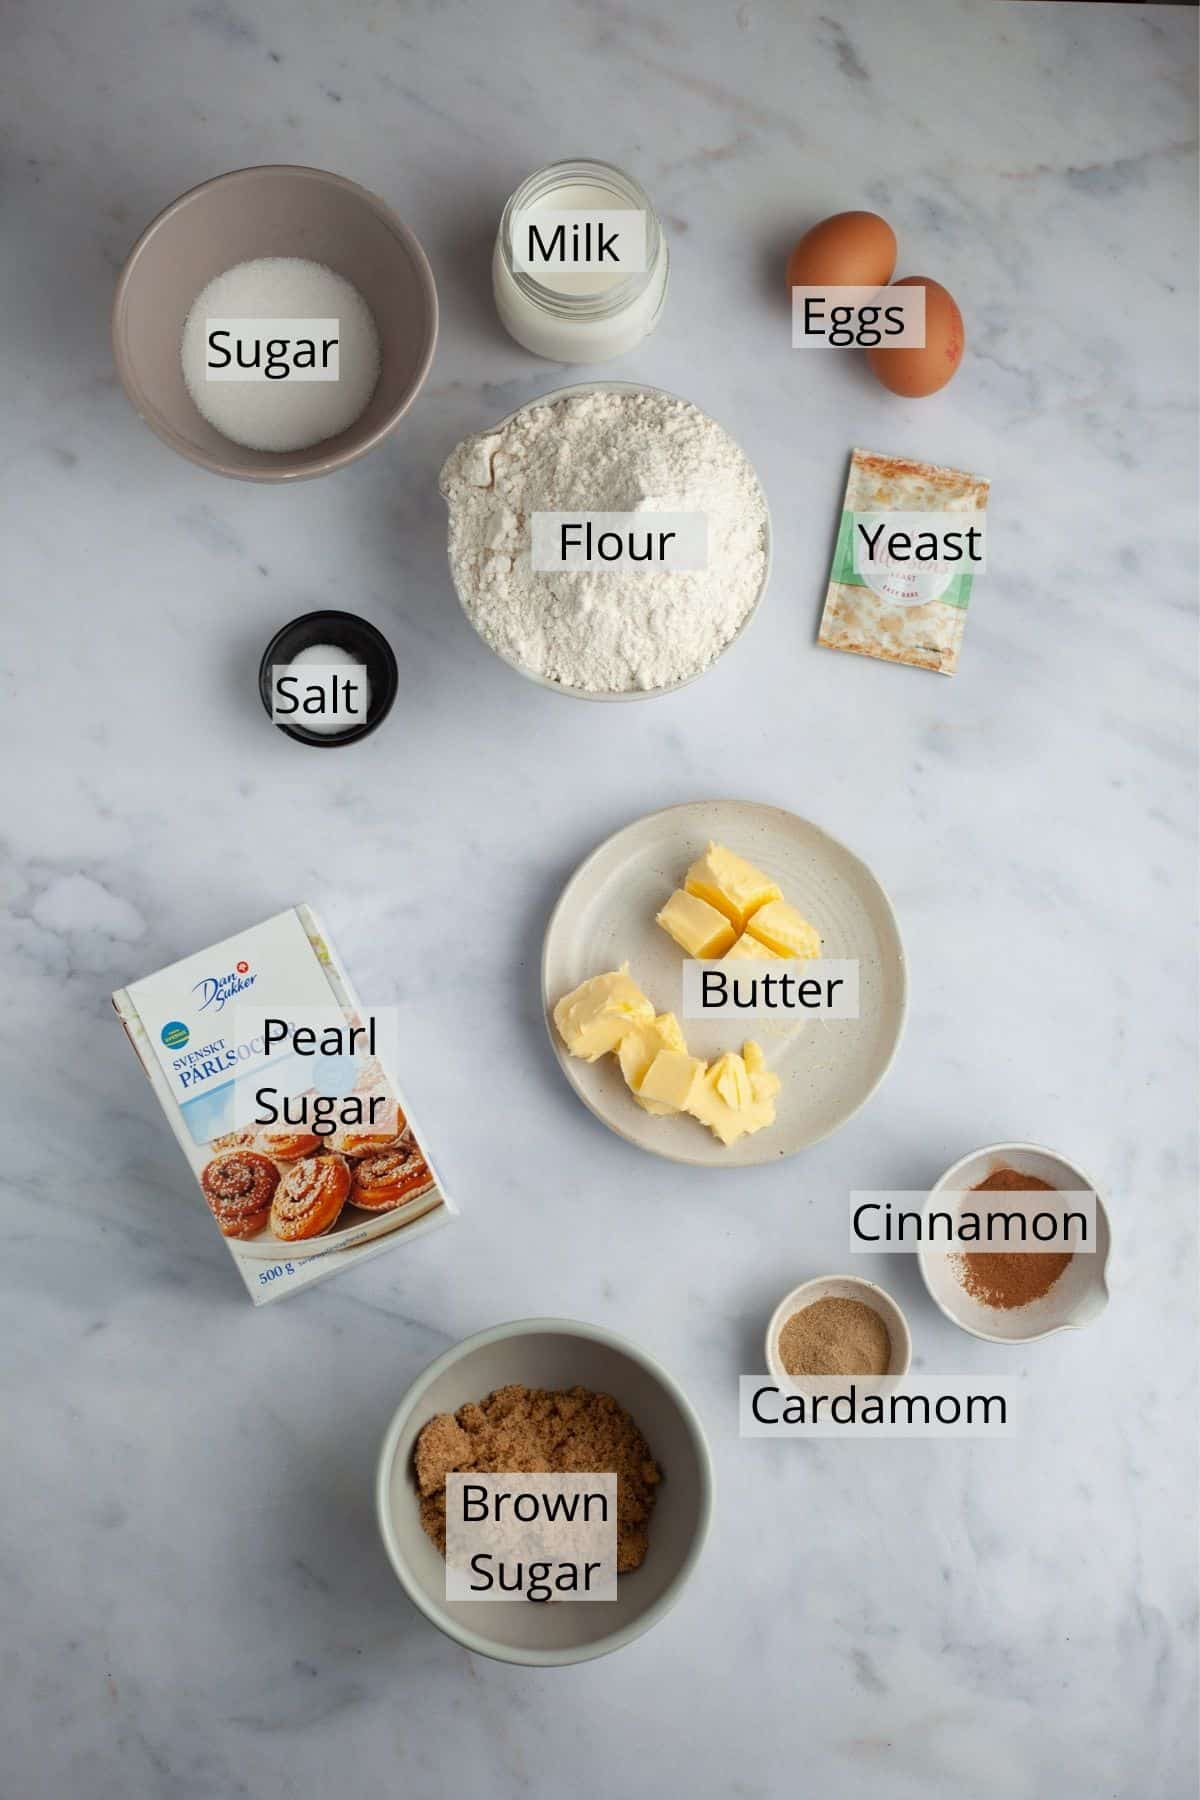 ingredients needed for Swedish cinnamon rolls